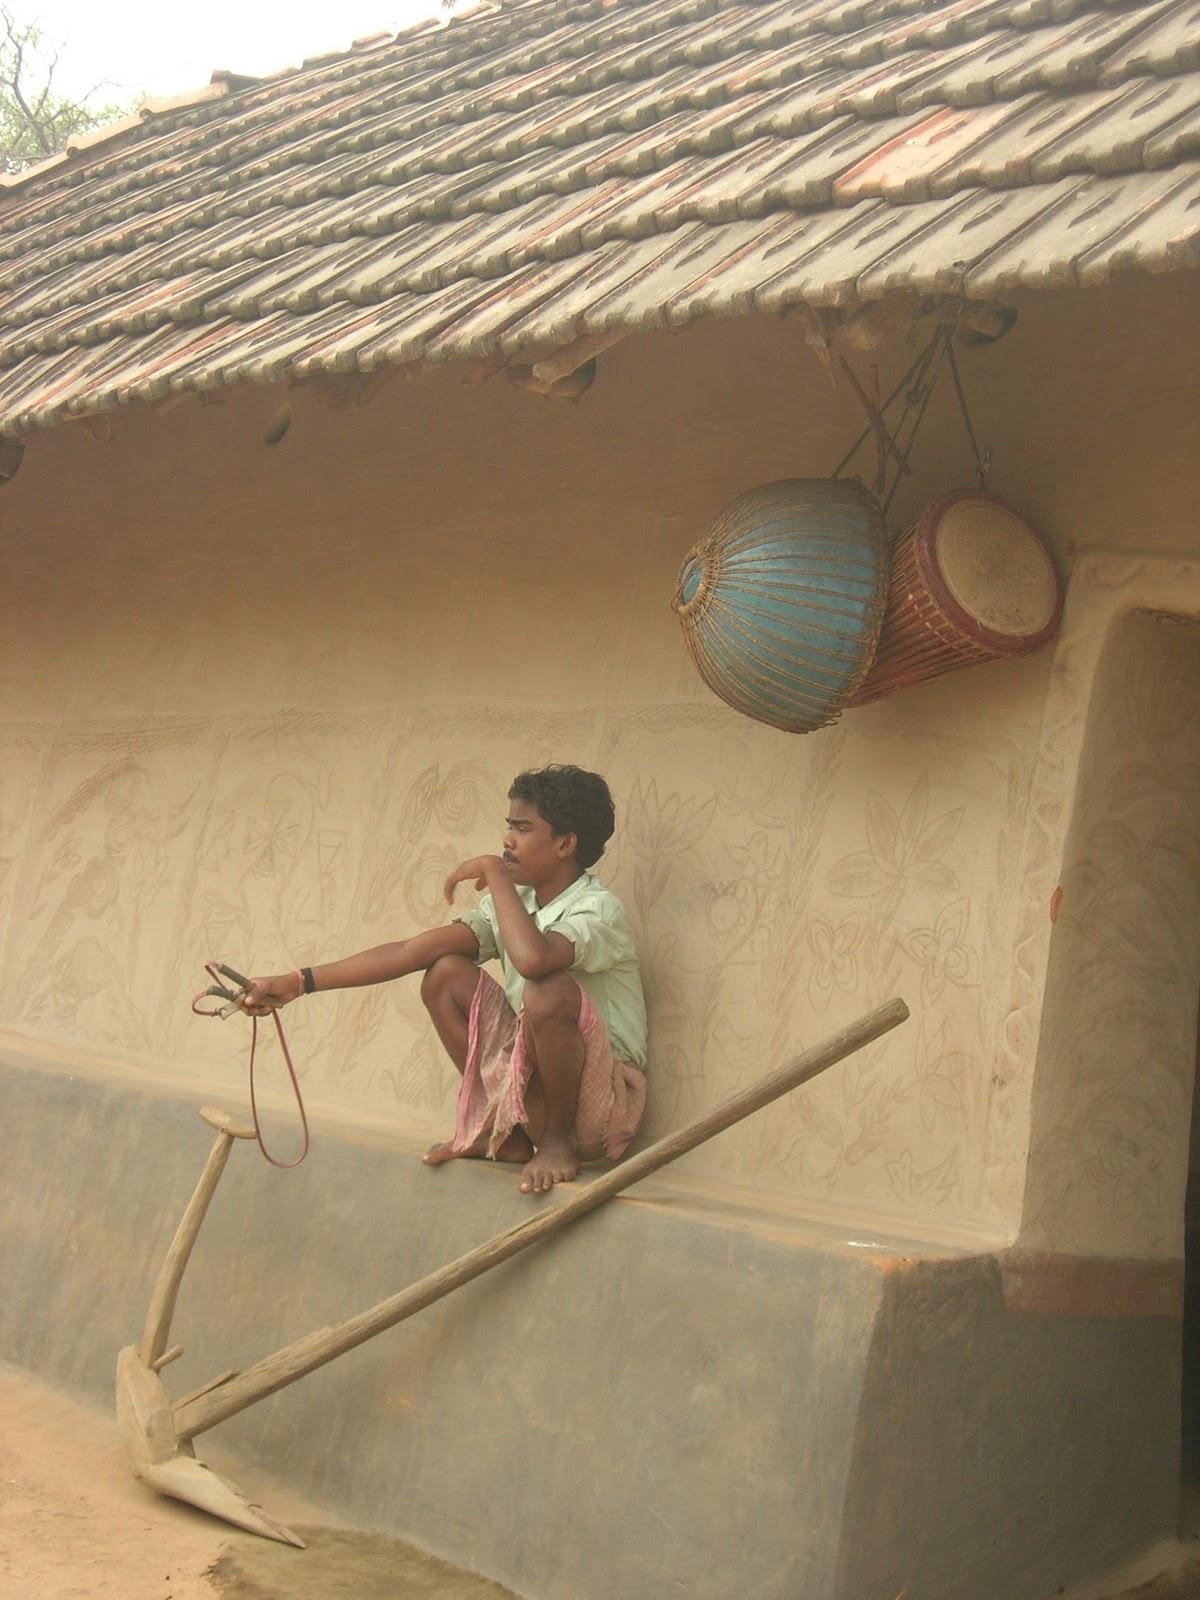 Swayampravo Dasgupta | Facebook